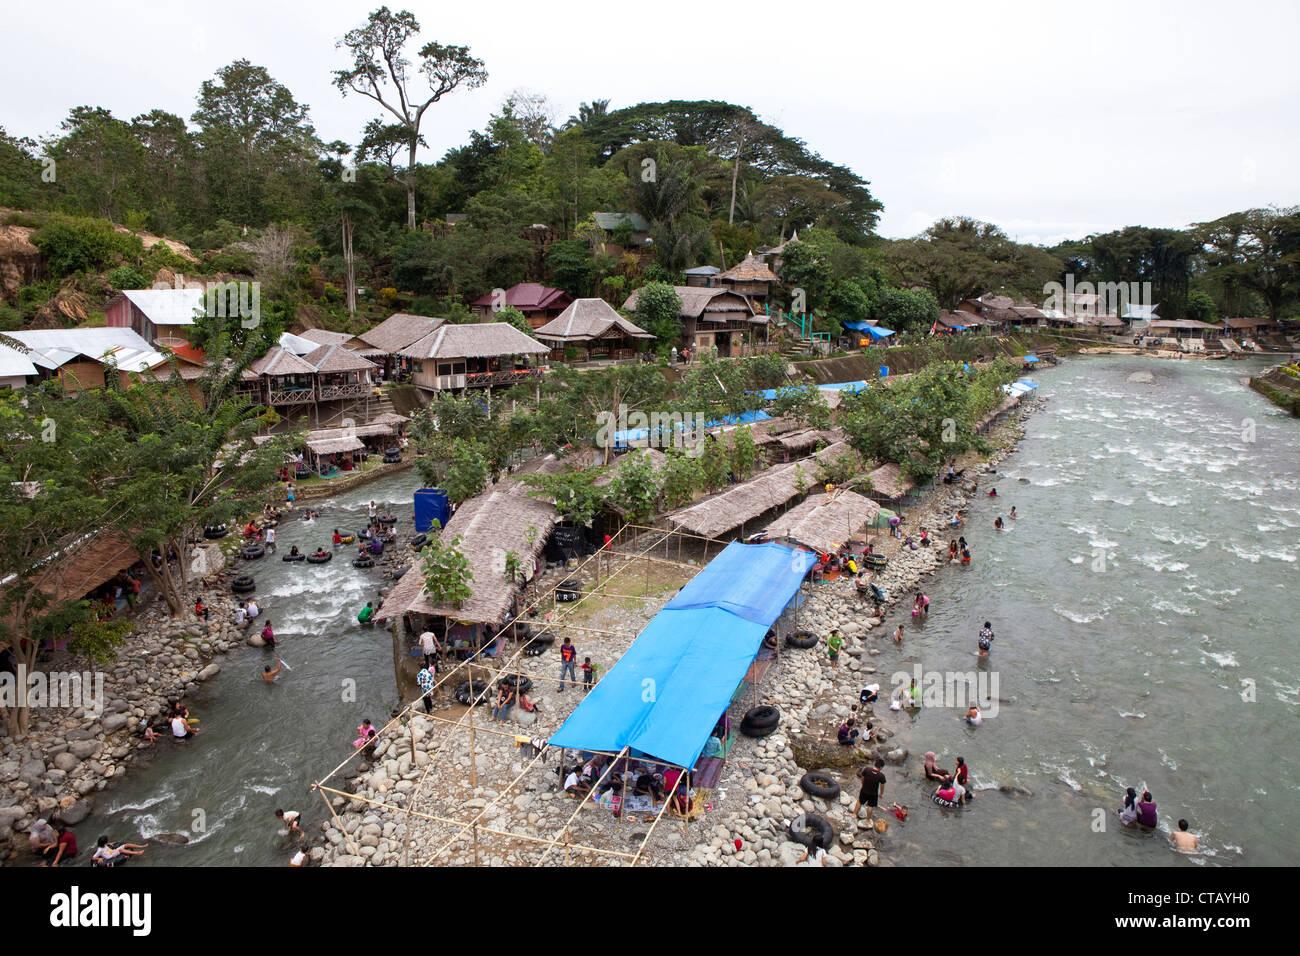 Bukit Lawang at the Bahorok river in North Sumatra province, Island of Sumatra, Indonesia, Southeast Asia - Stock Image